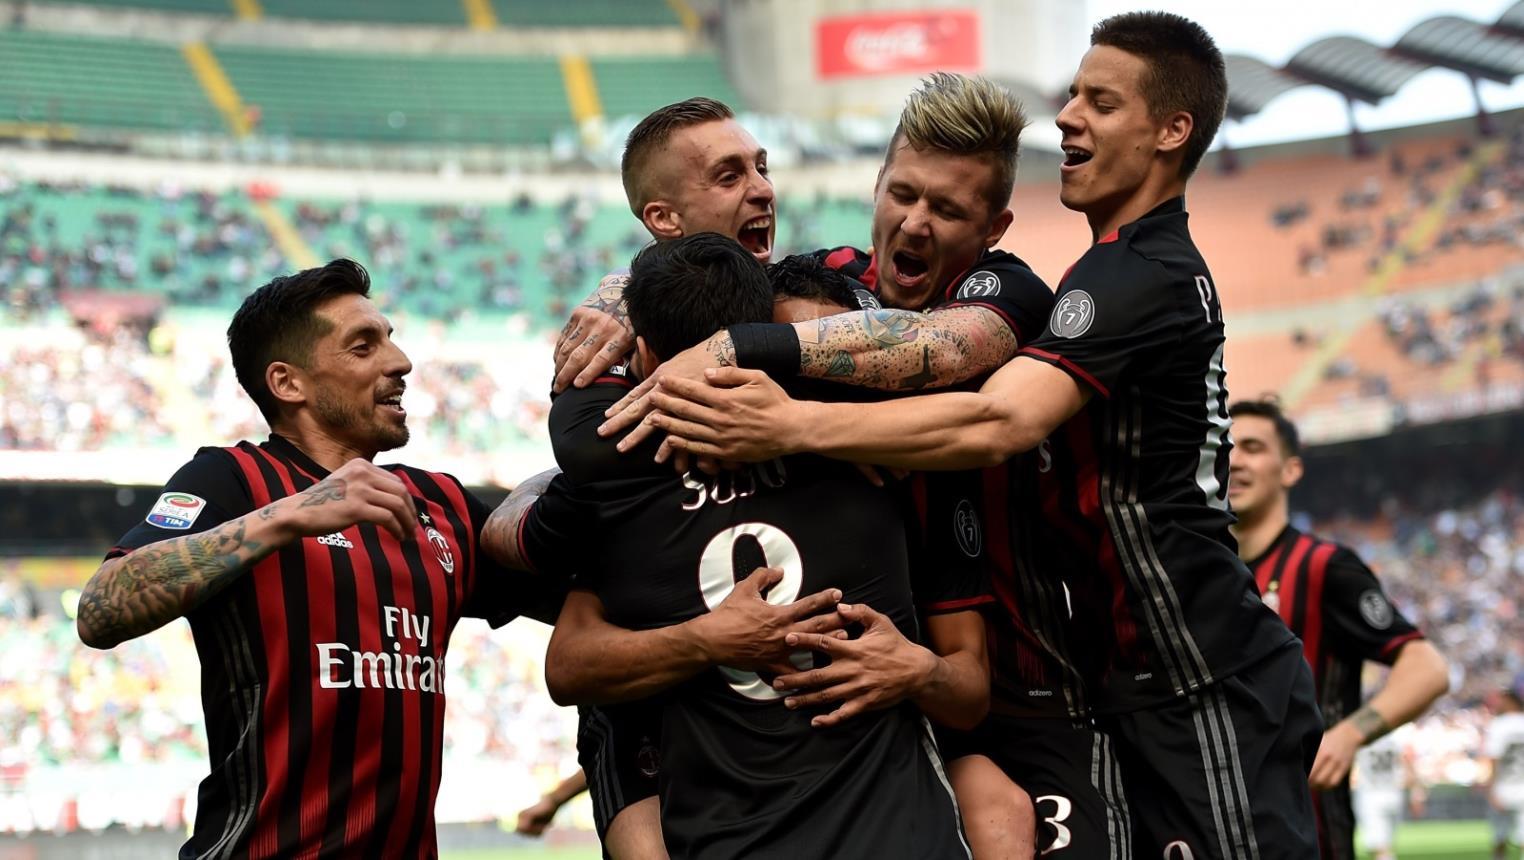 Photo of ديربي ميلانو ينتهي بتعادل قاتل في الثواني الأخيرة